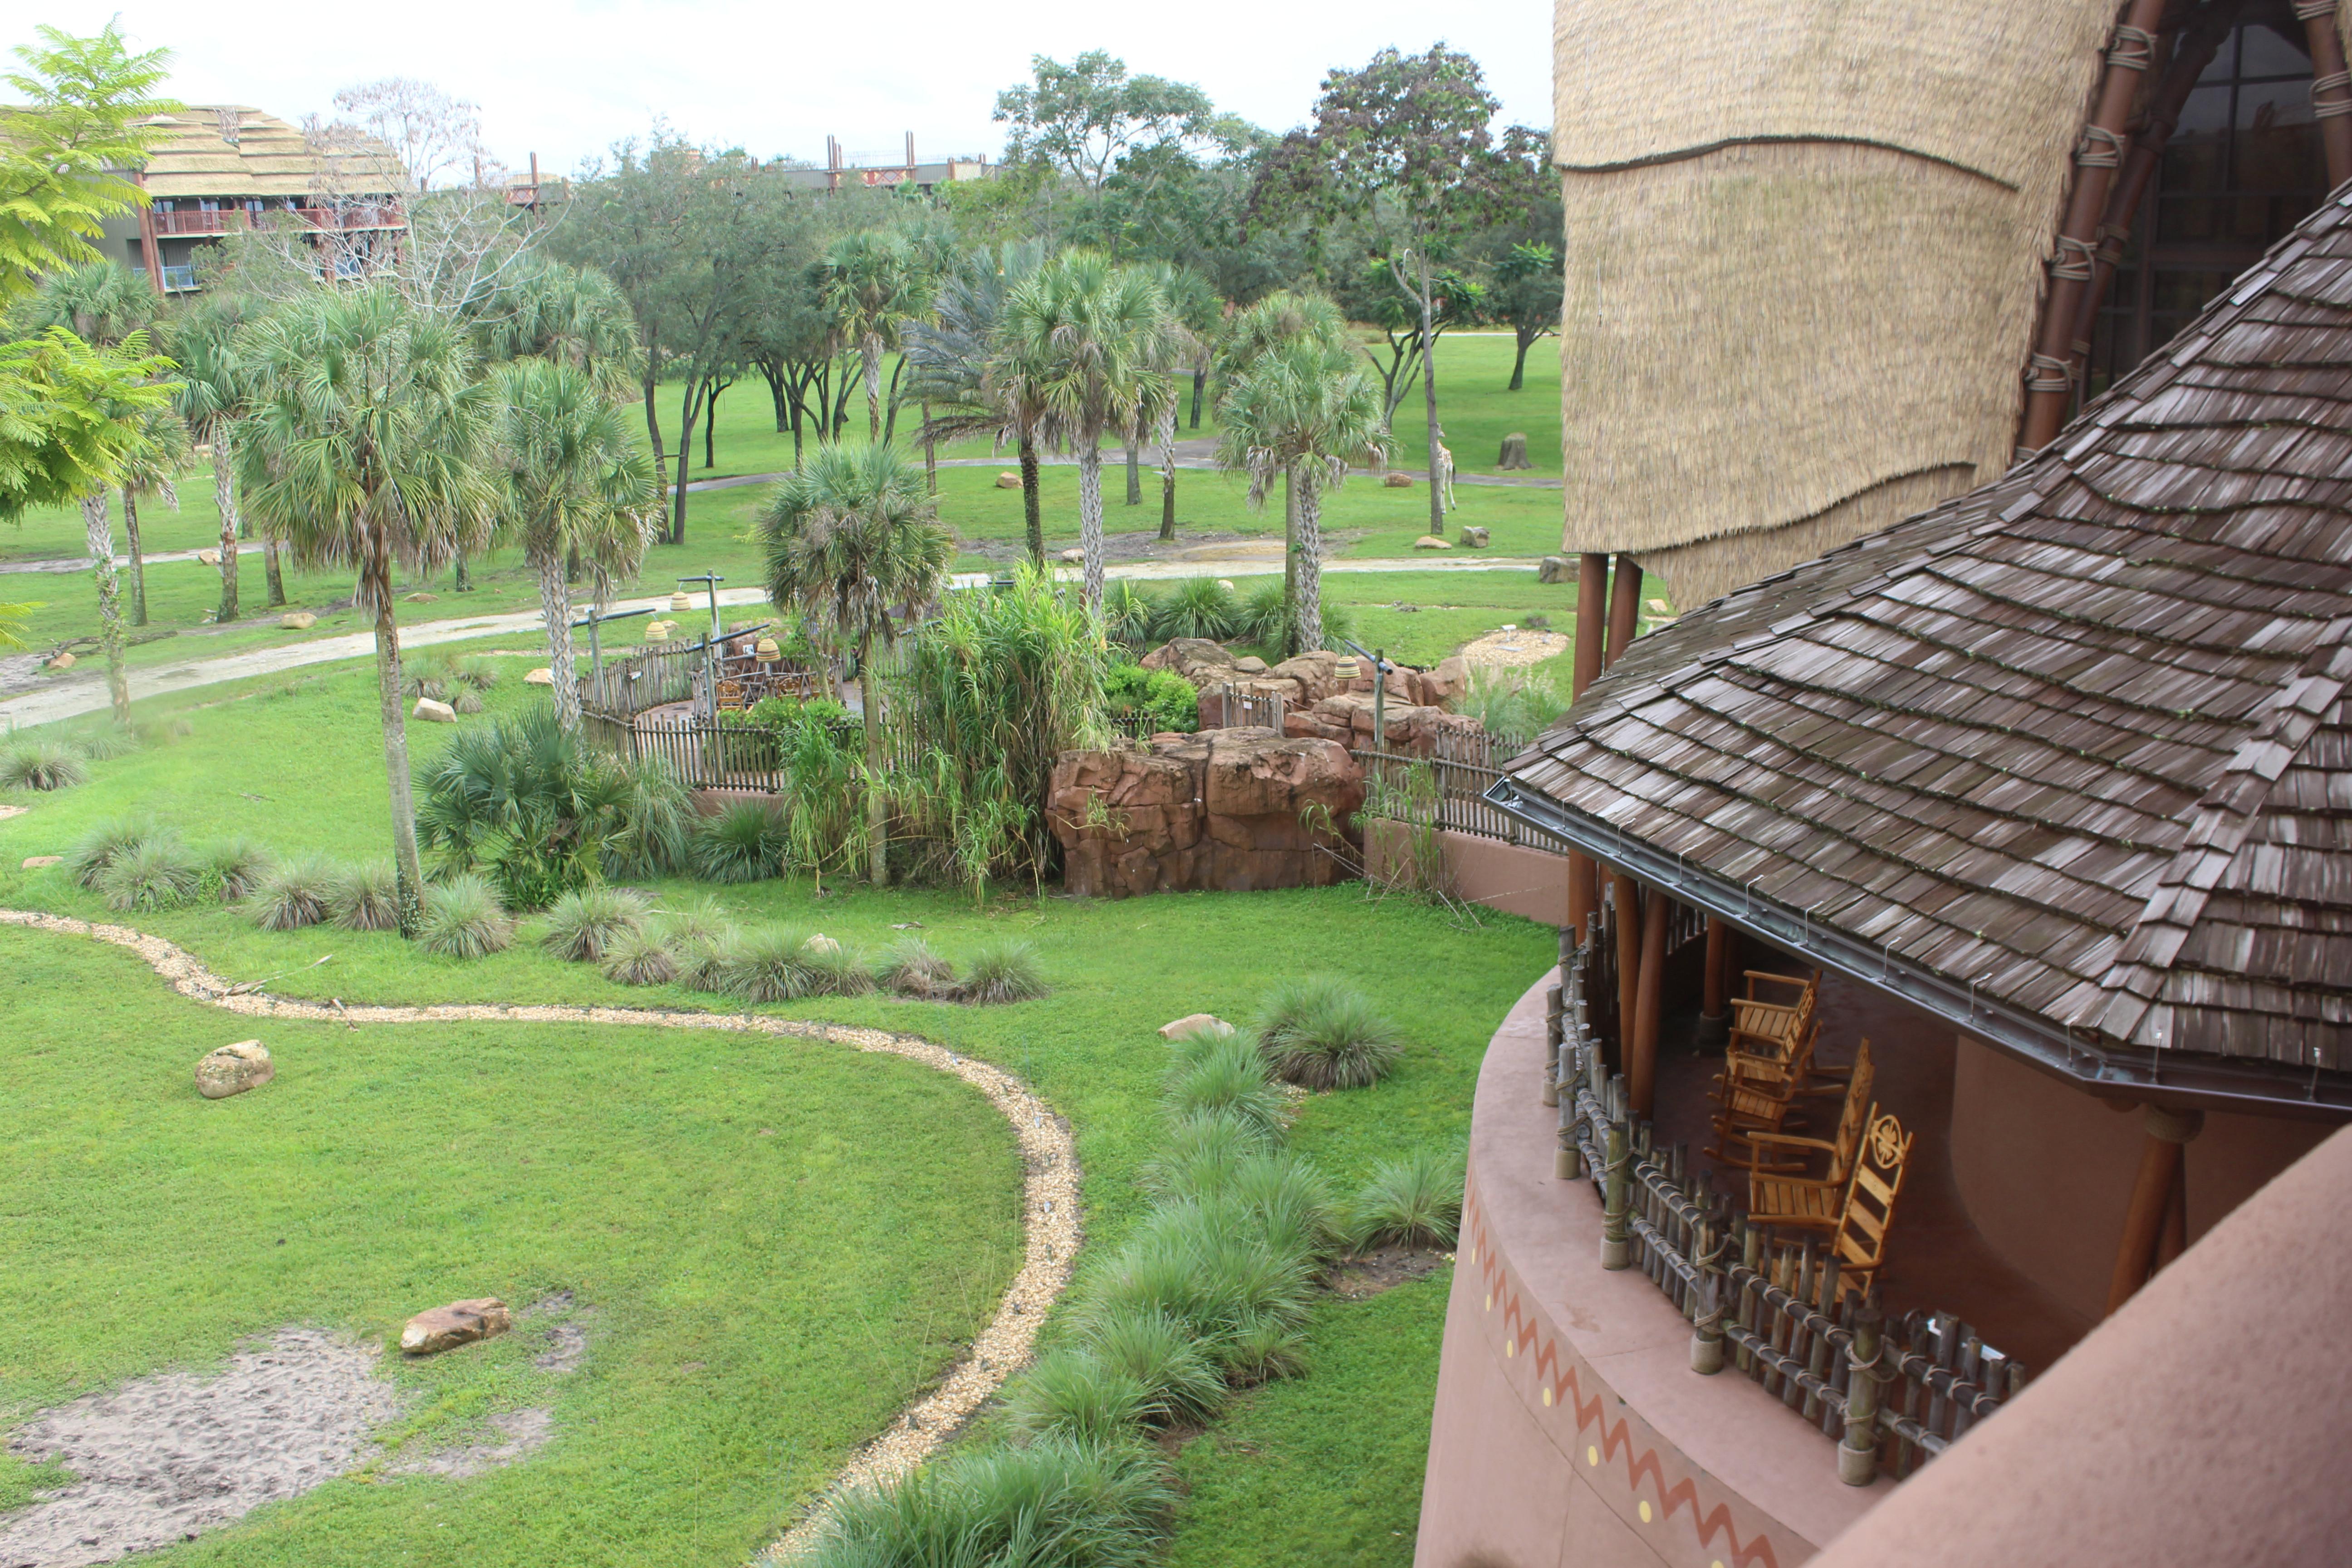 A public savanna viewing area at Kidani Village